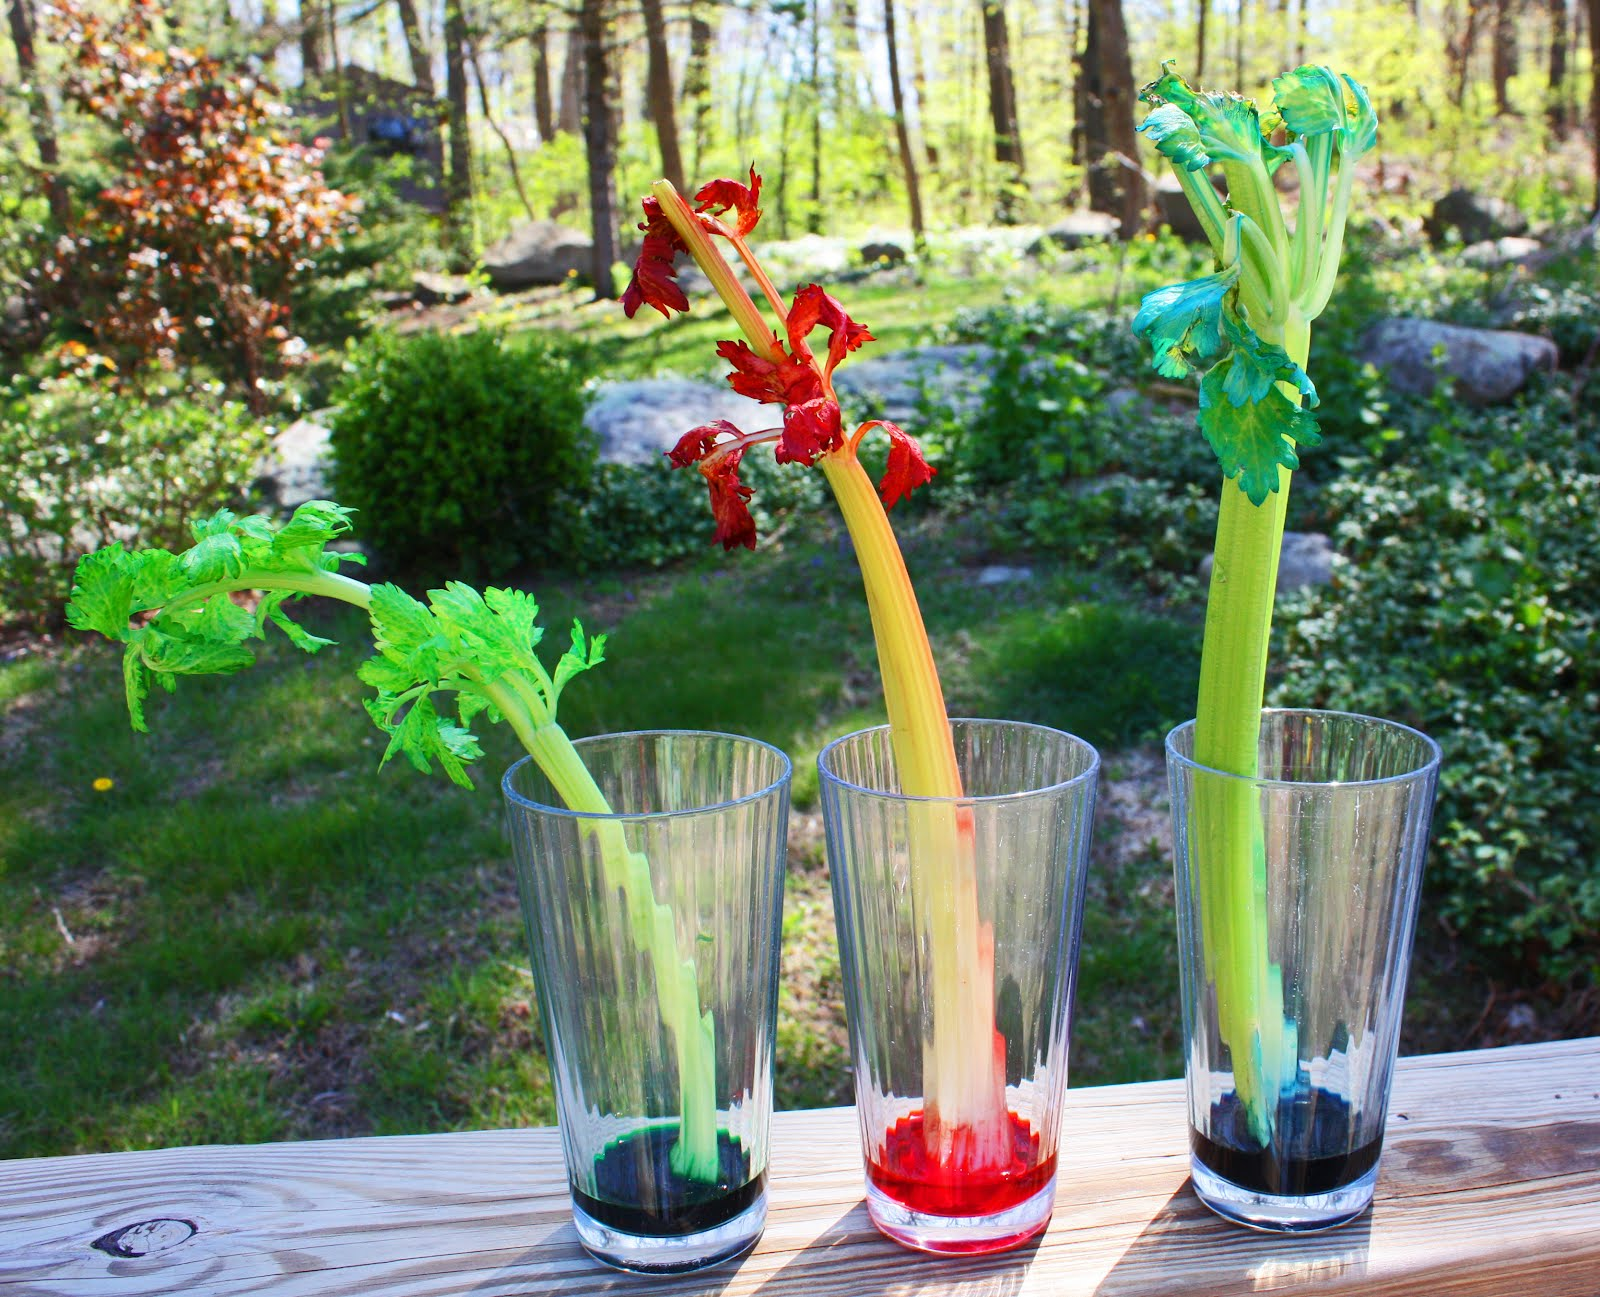 Considering Celery